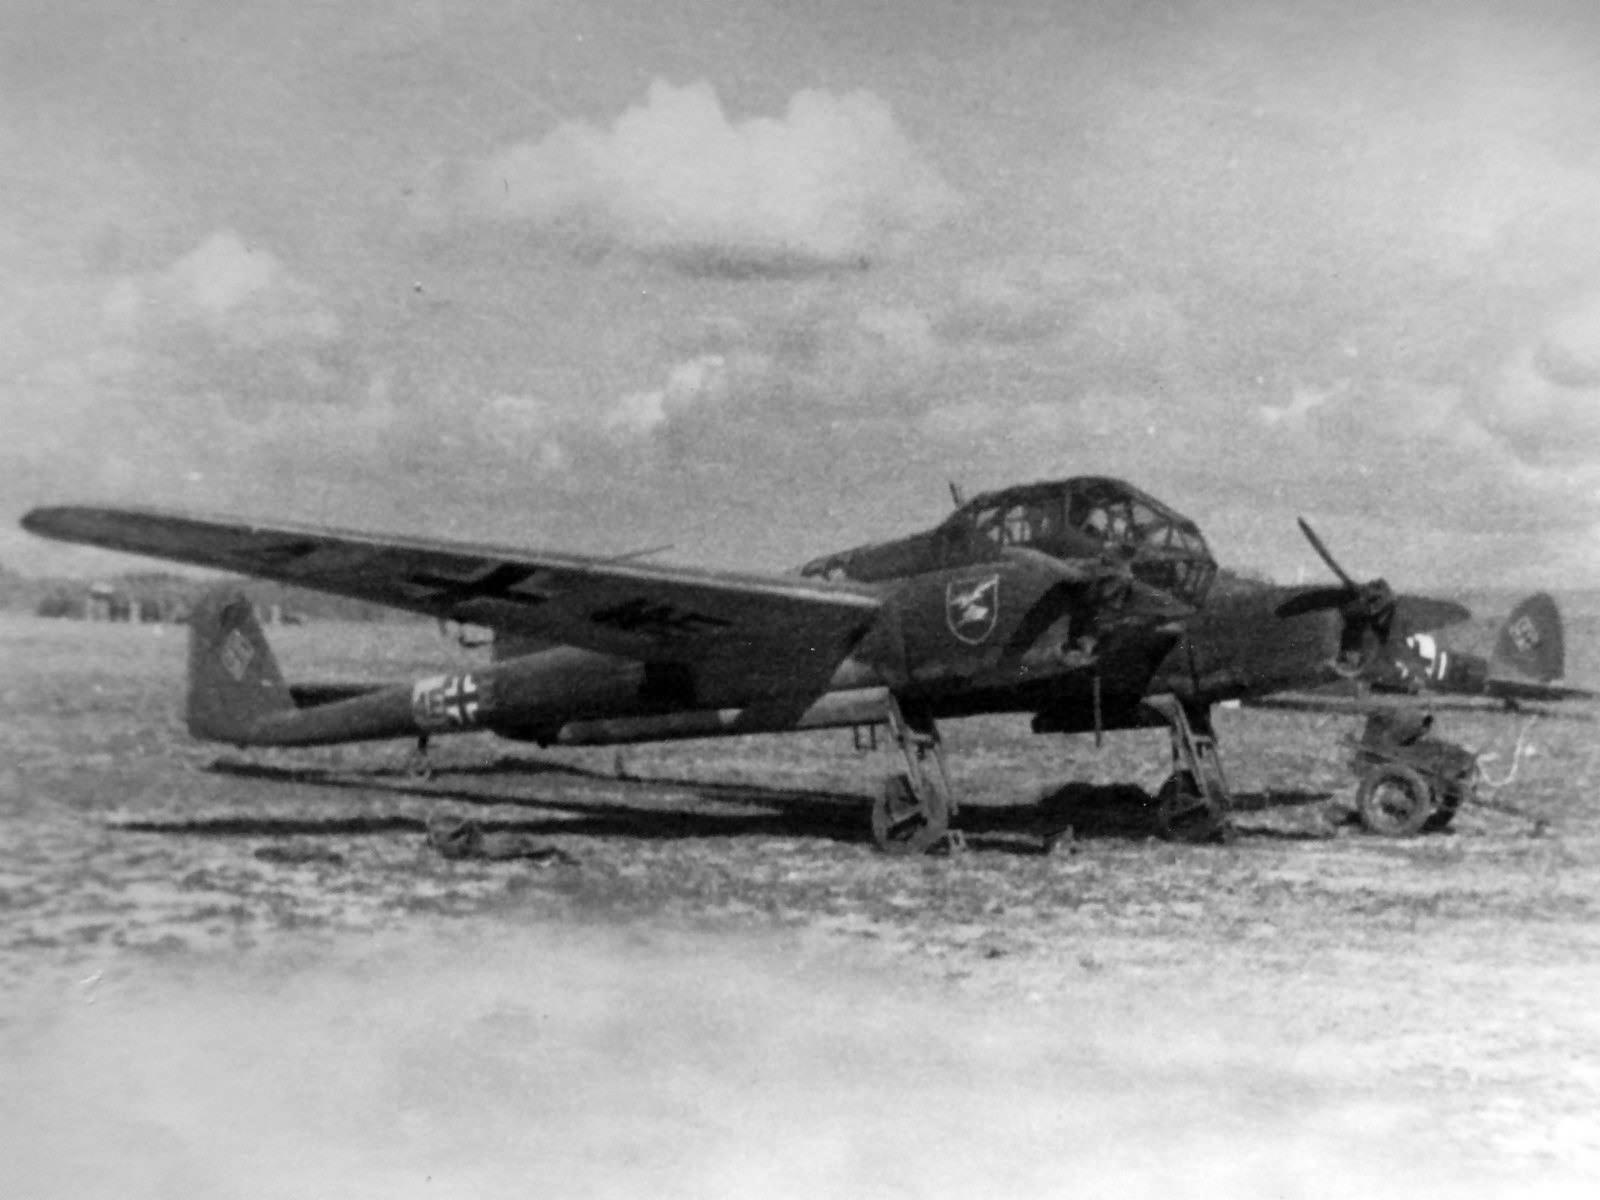 Focke-Wulf Fw 189 Uhu of the Aufklarungsgruppe 13